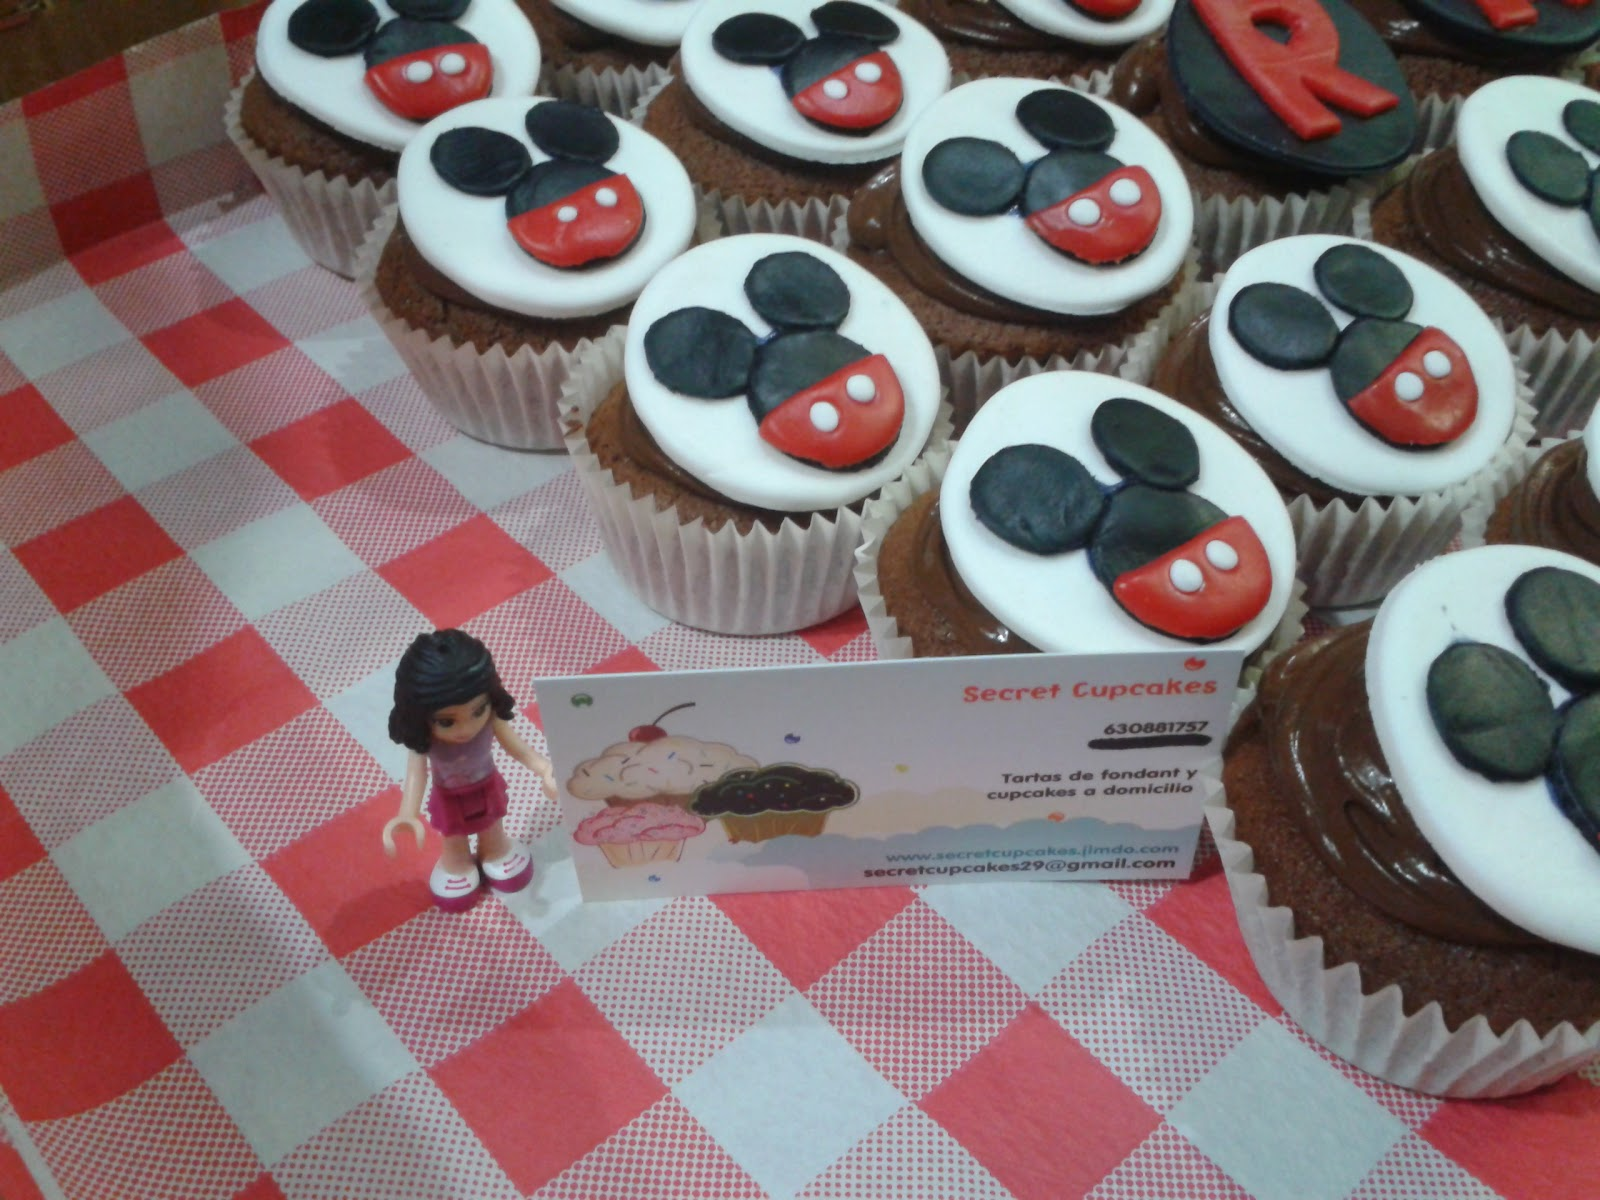 Cupcakes tenerife cupcakes de mickey - Cupcakes tenerife ...